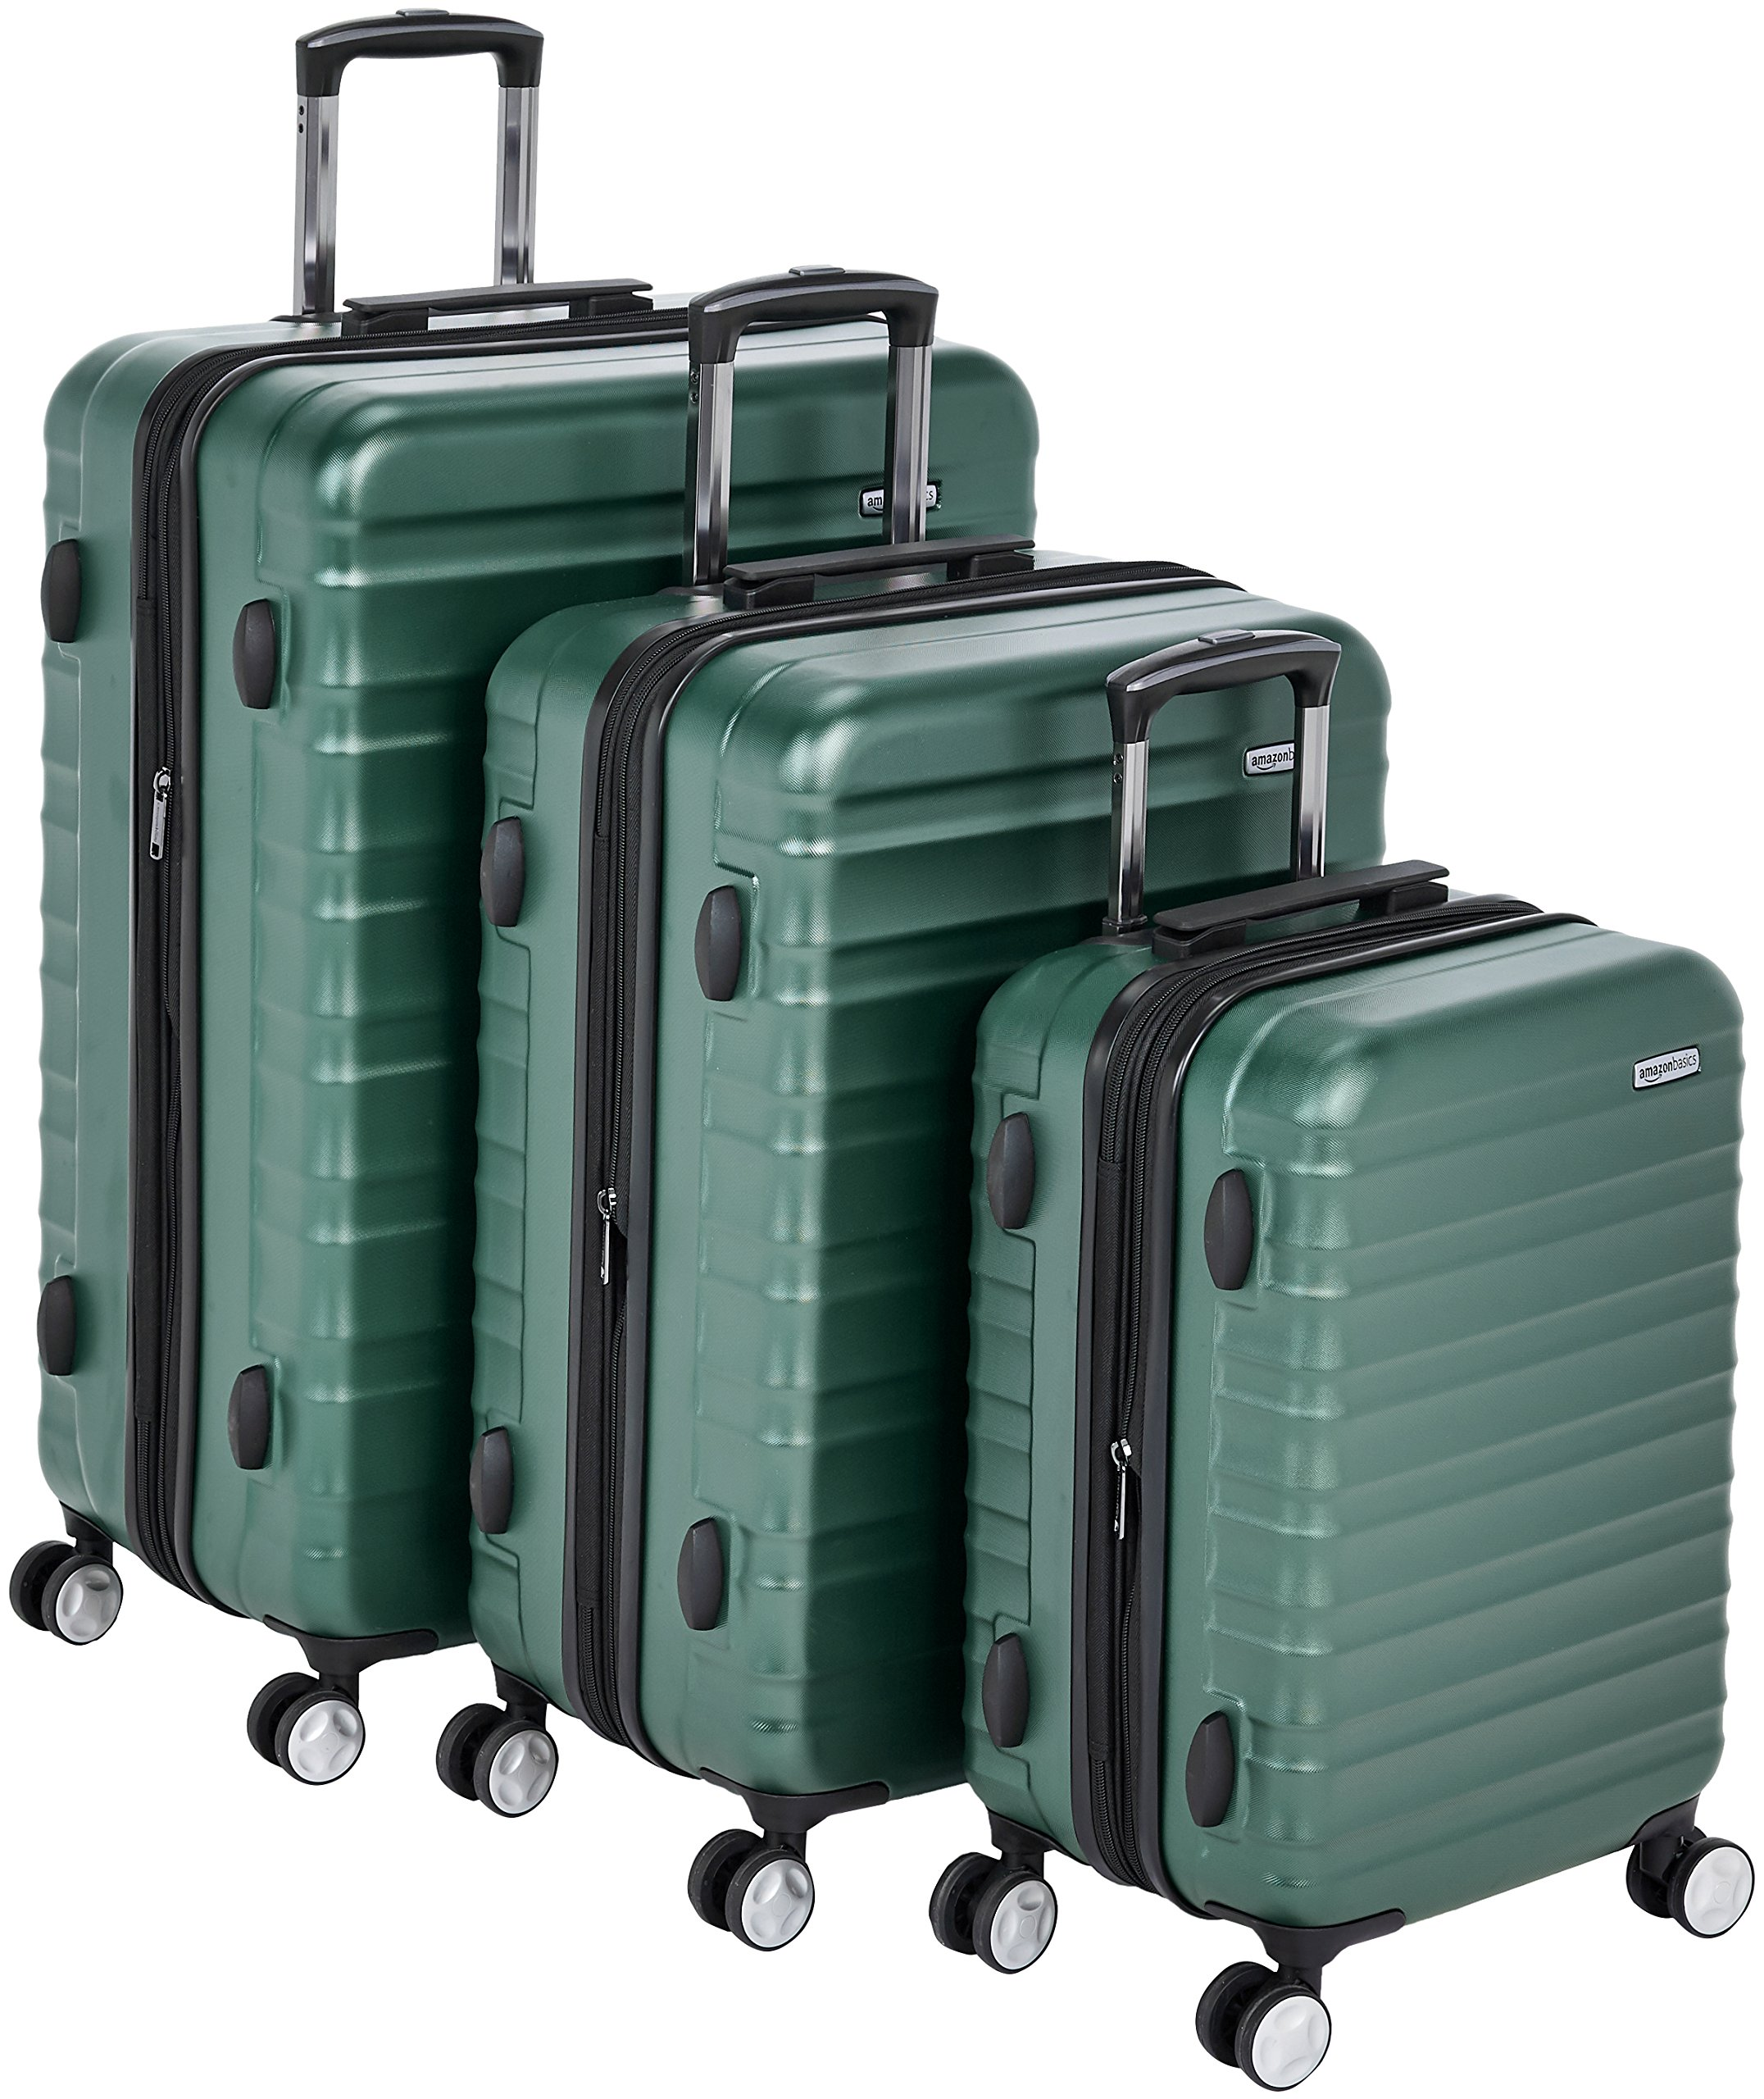 AmazonBasics Premium Hardside Spinner Luggage with Built-In TSA Lock - 3-Piece Set (20'', 24'', 28''), Green